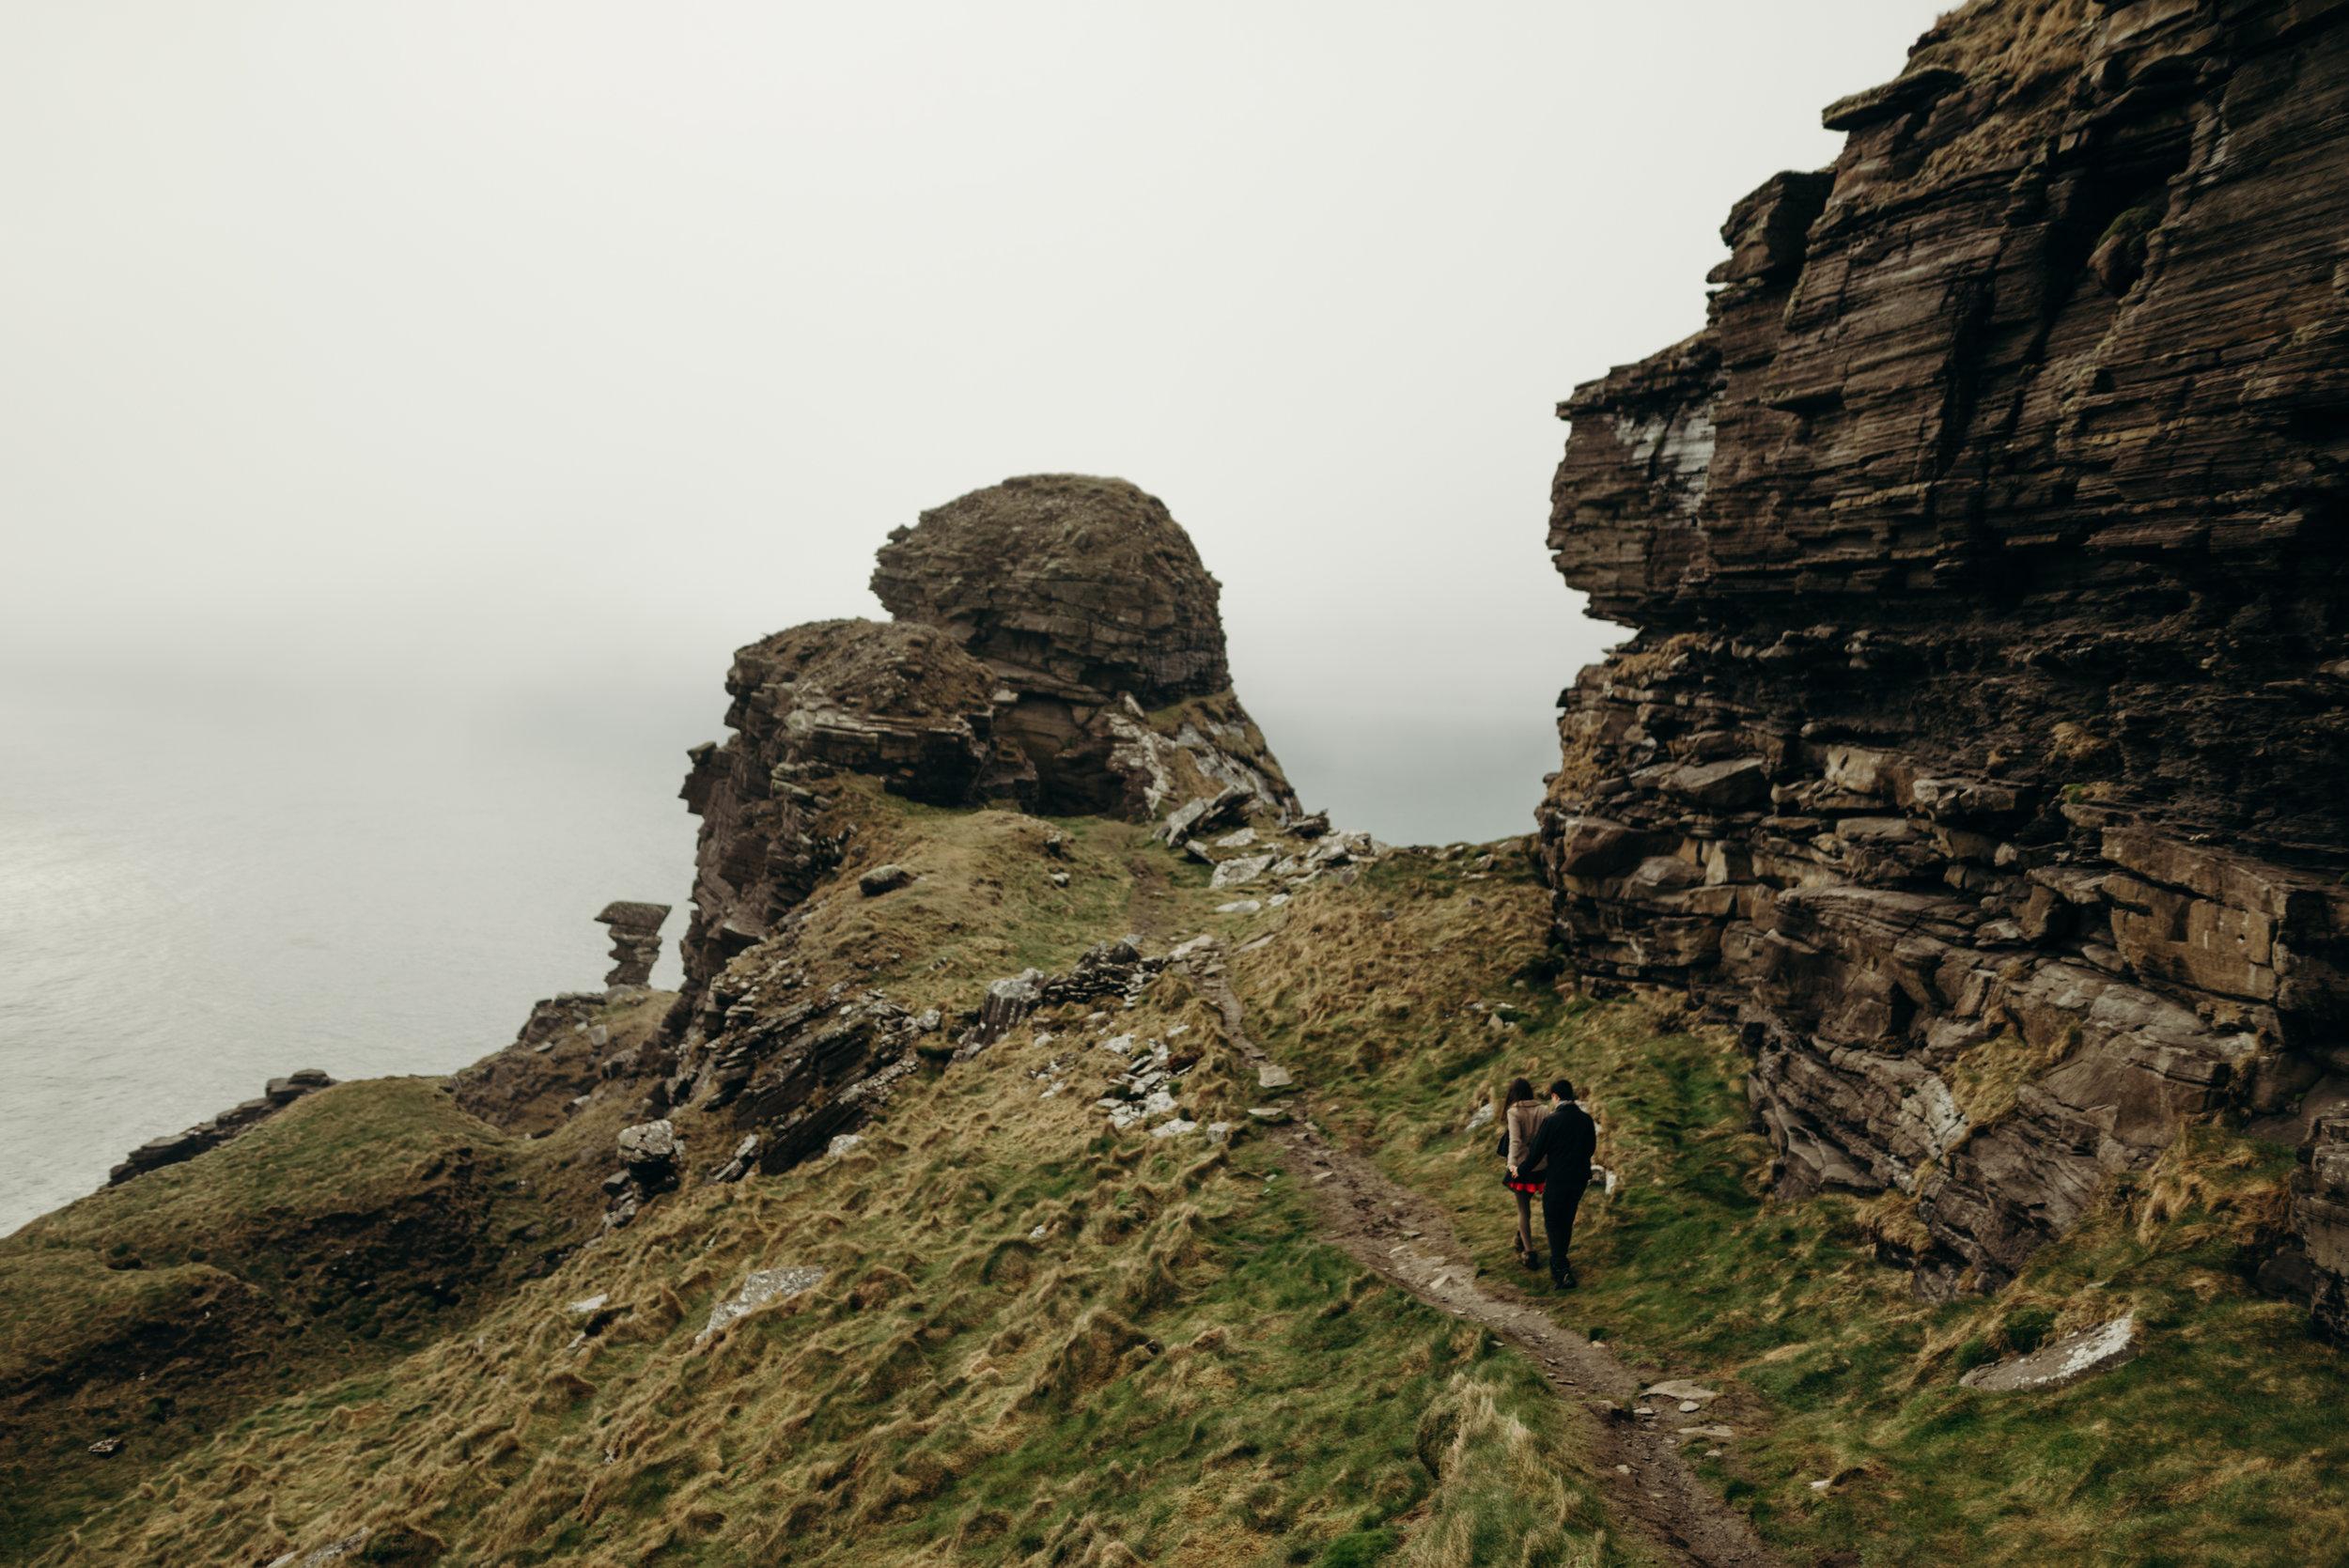 Cliffs Of Moher Engagement Session - Cliffs of Moher Proposal - Cliffs of Mhoer Elopement_6160-Edit-4.jpg